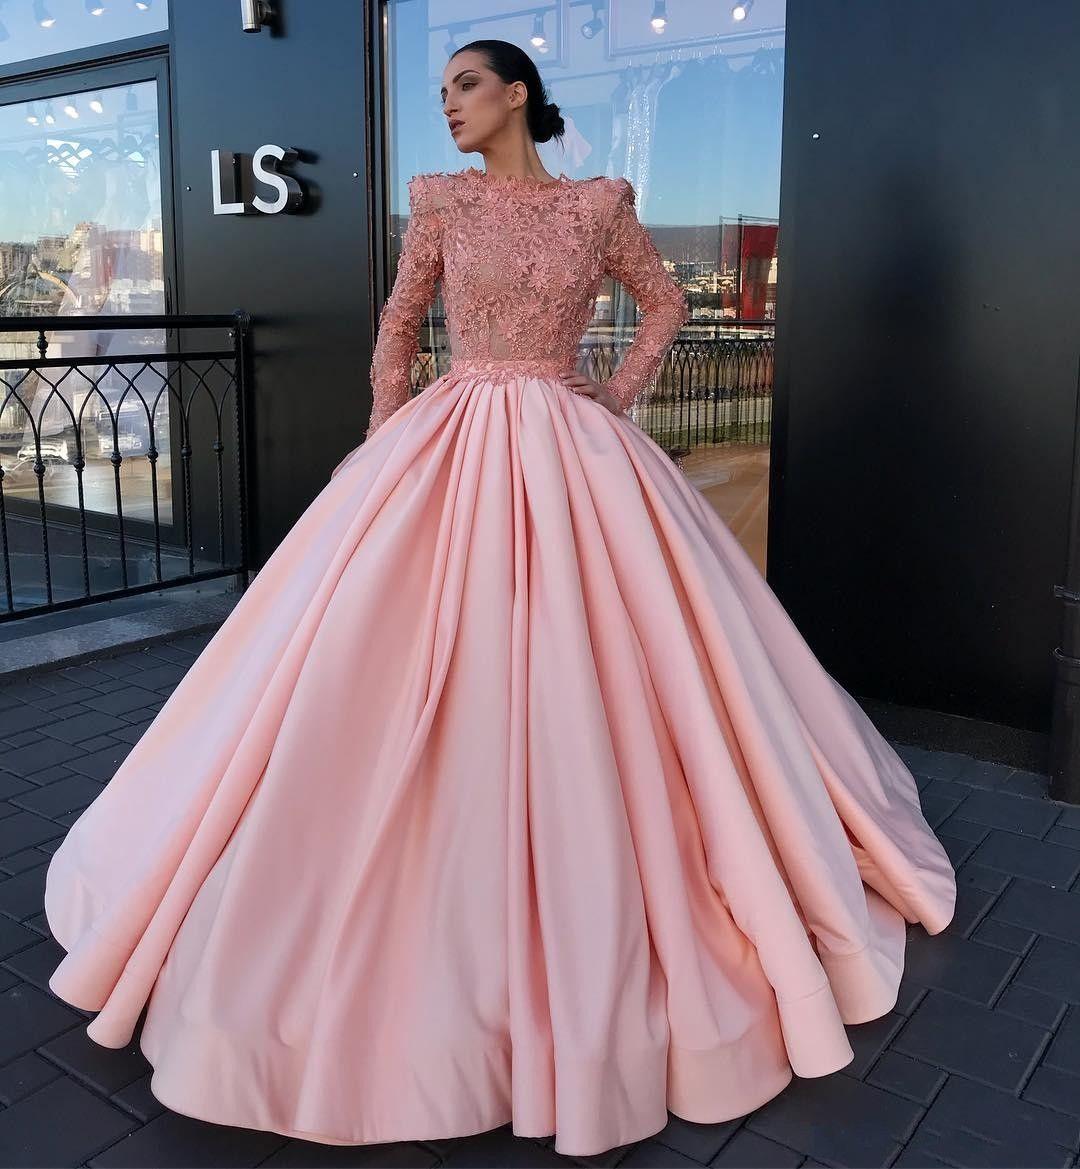 290bb9fa233f Acquista 2018 New Pink Ball Gown Quinceanera Abiti Sheer Neck Full Lace Maniche  Lunghe 3D Fiori Floreali Perle Sweet 16 Abiti Prom Dresses A  183.32 Dal ...